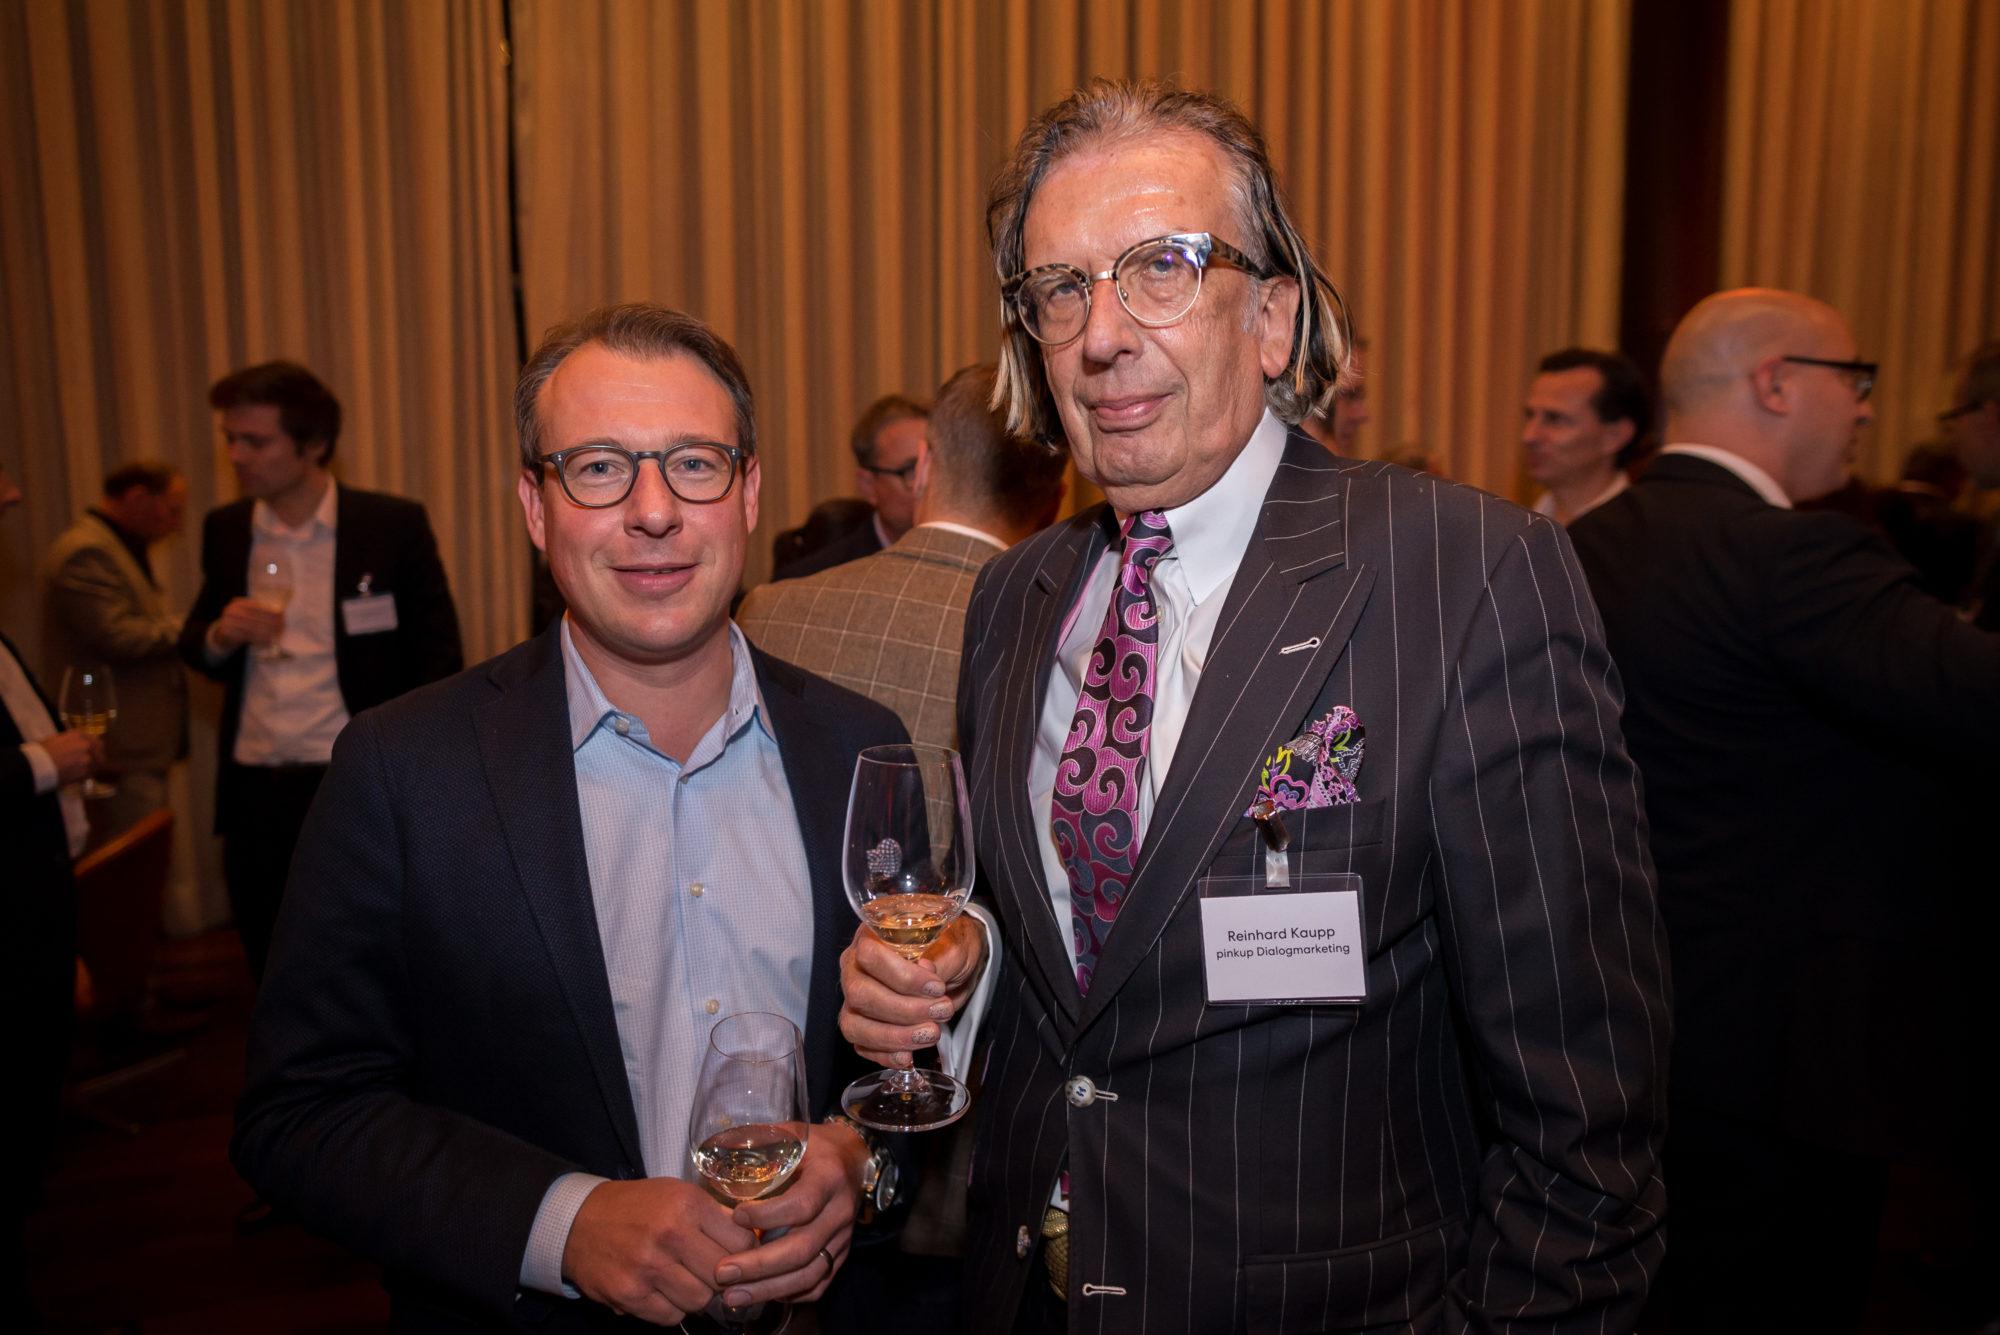 Kai Kruthoff (Stimmt AG), Reinhard Kaupp (Pinkup Dialogmarketing AG)